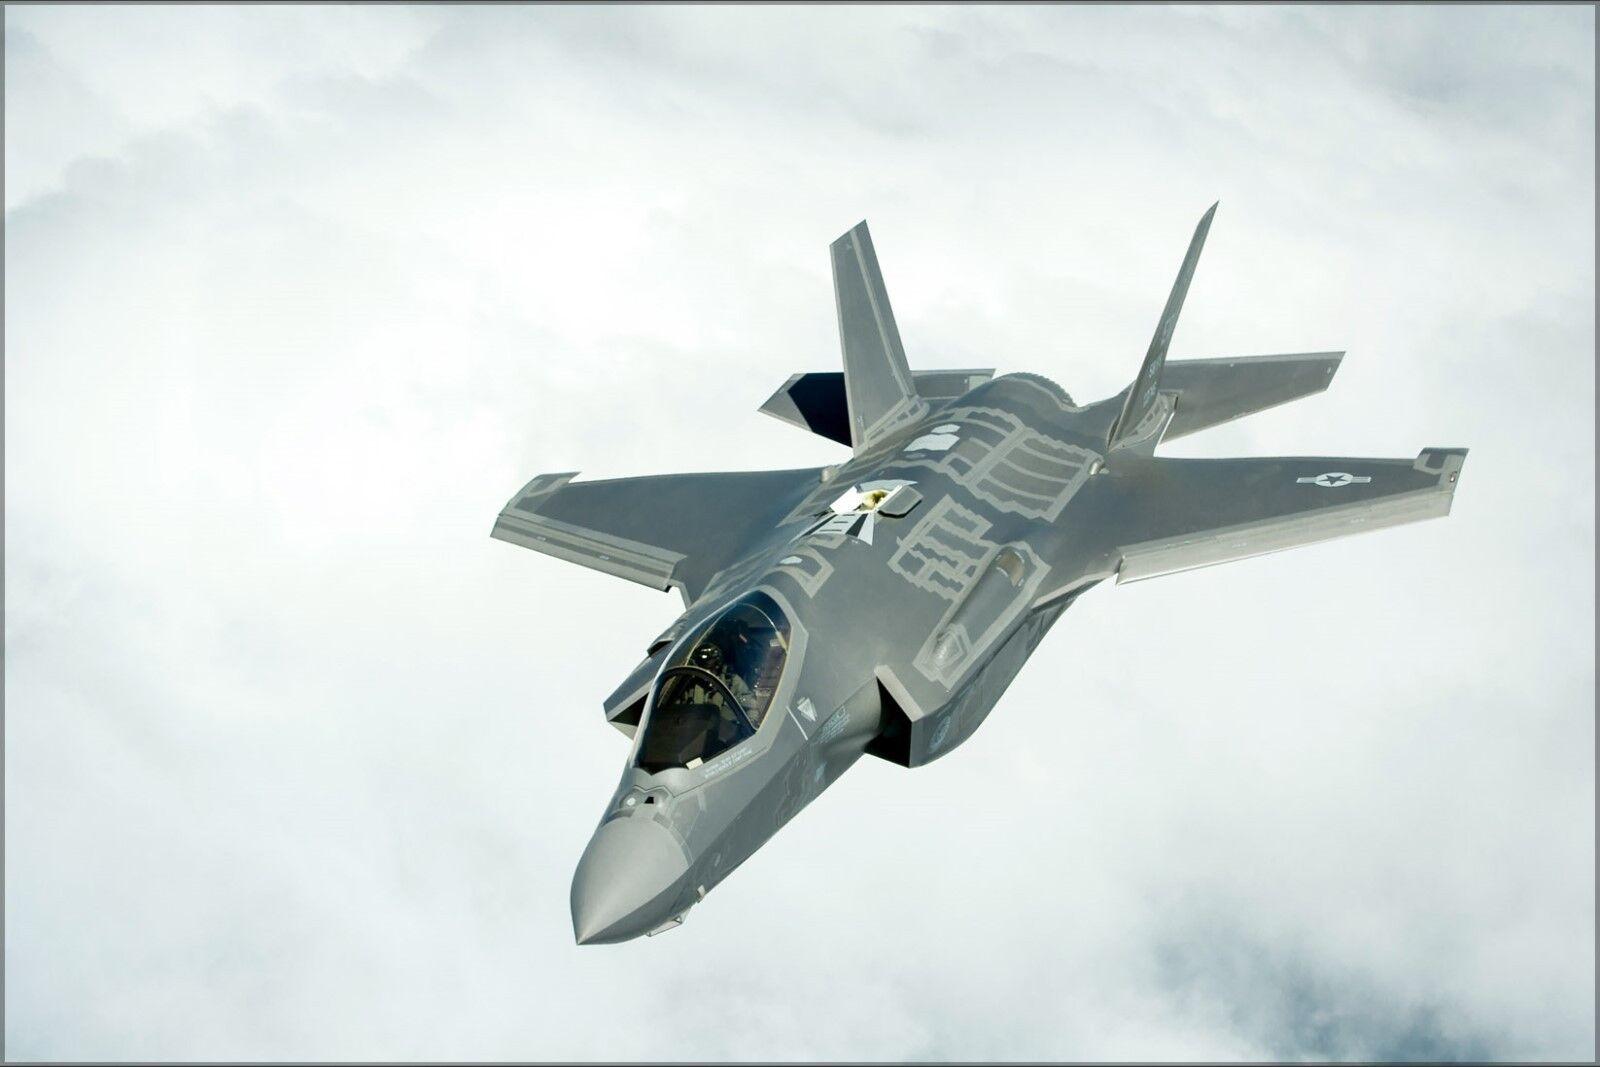 Plakat, Viele Größen; F-35a Lightning Li Flugzeug Über